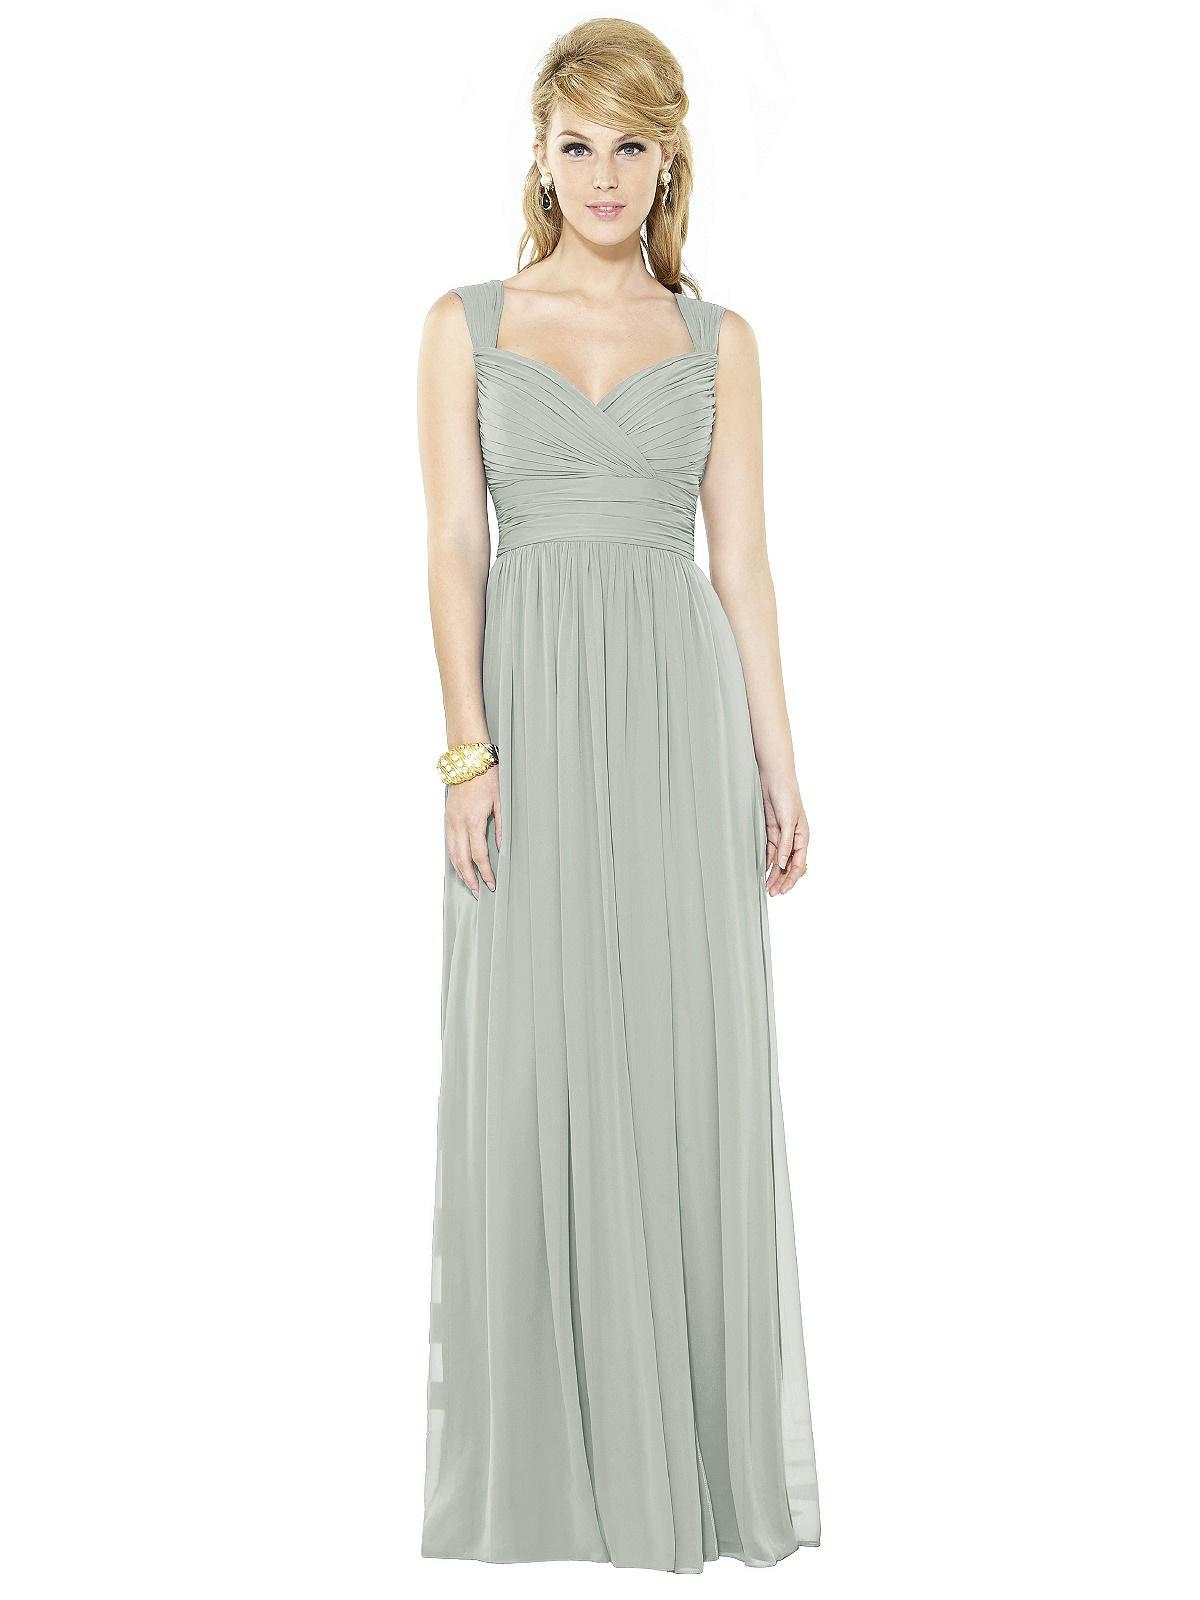 390fb996113 Coral Bridesmaid Dresses Uk High Street - Data Dynamic AG